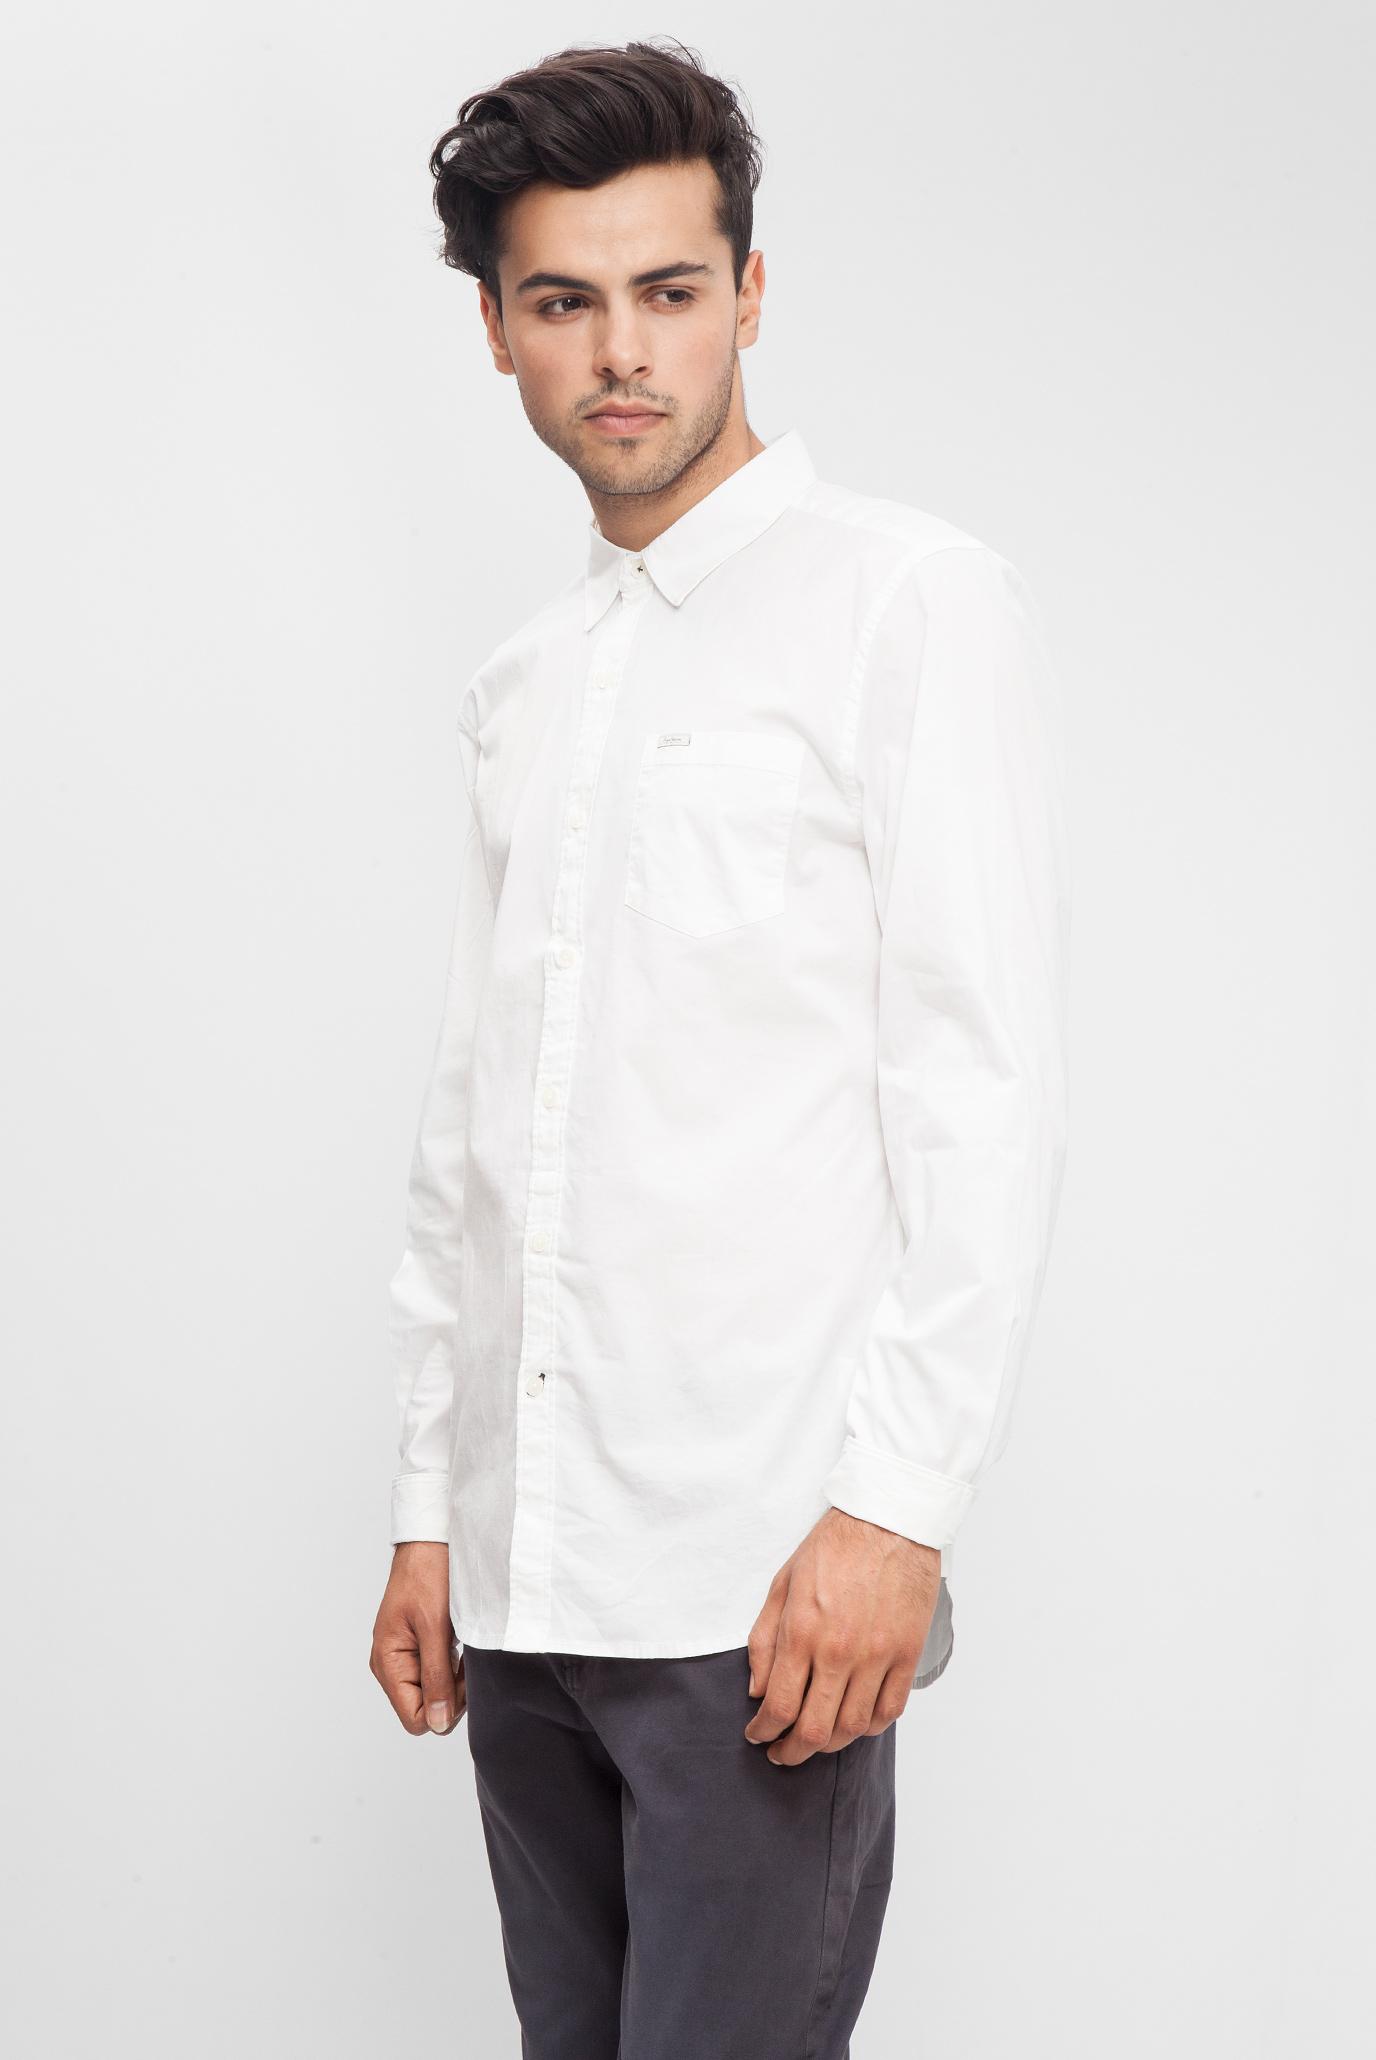 db0120e3915 Купить Мужская белая хлопковая рубашка Pepe Jeans Pepe Jeans PM302976 –  Киев